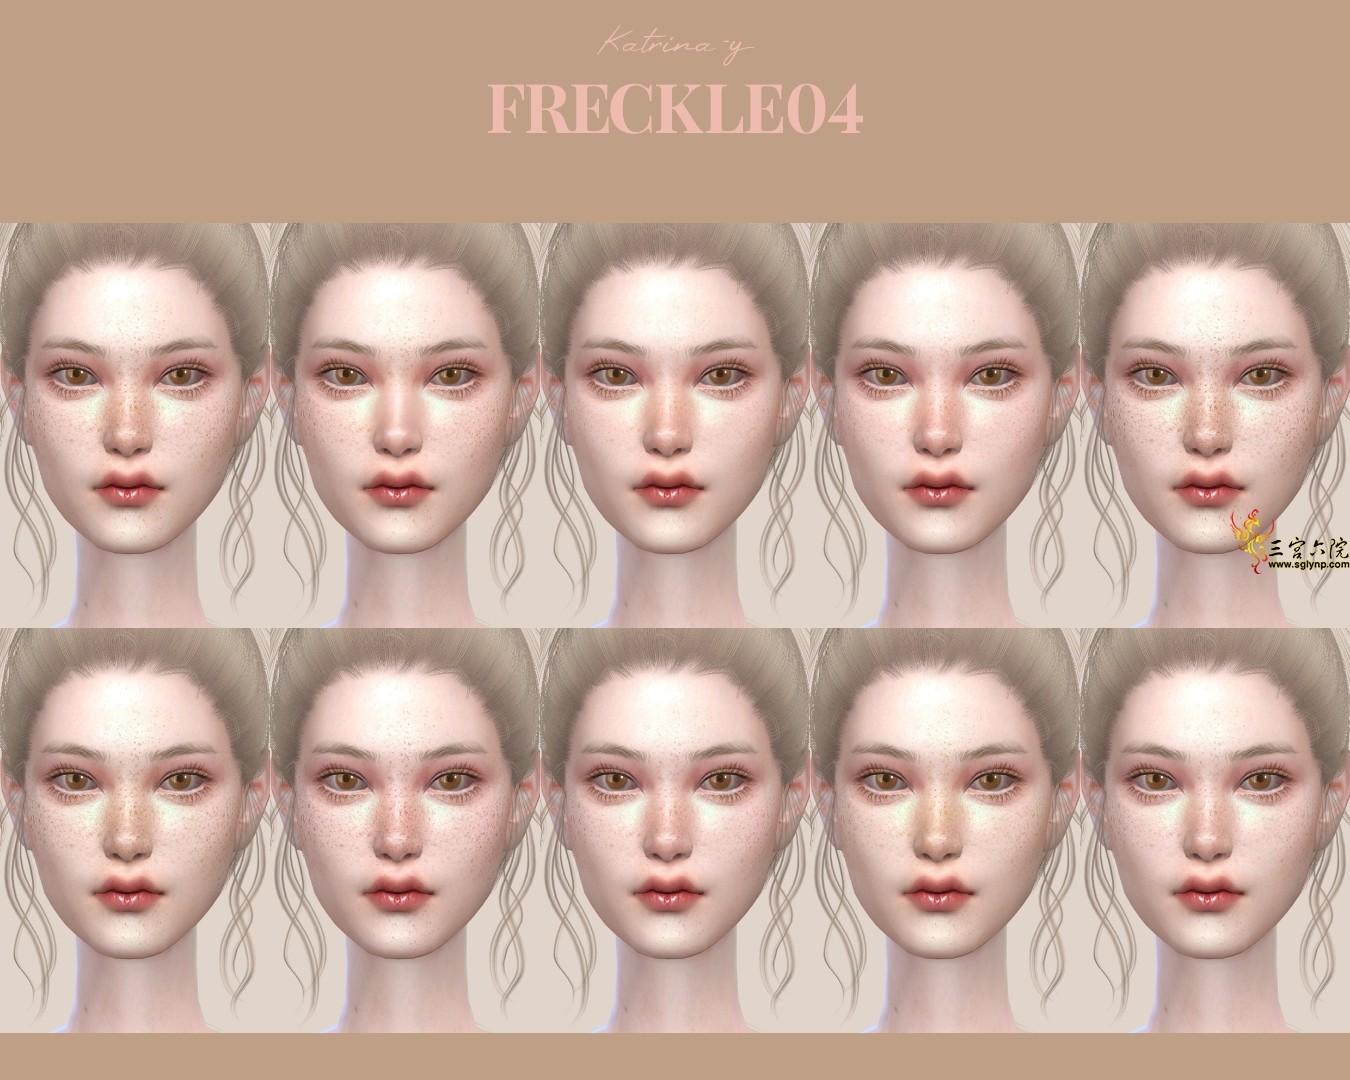 freckle04.jpg